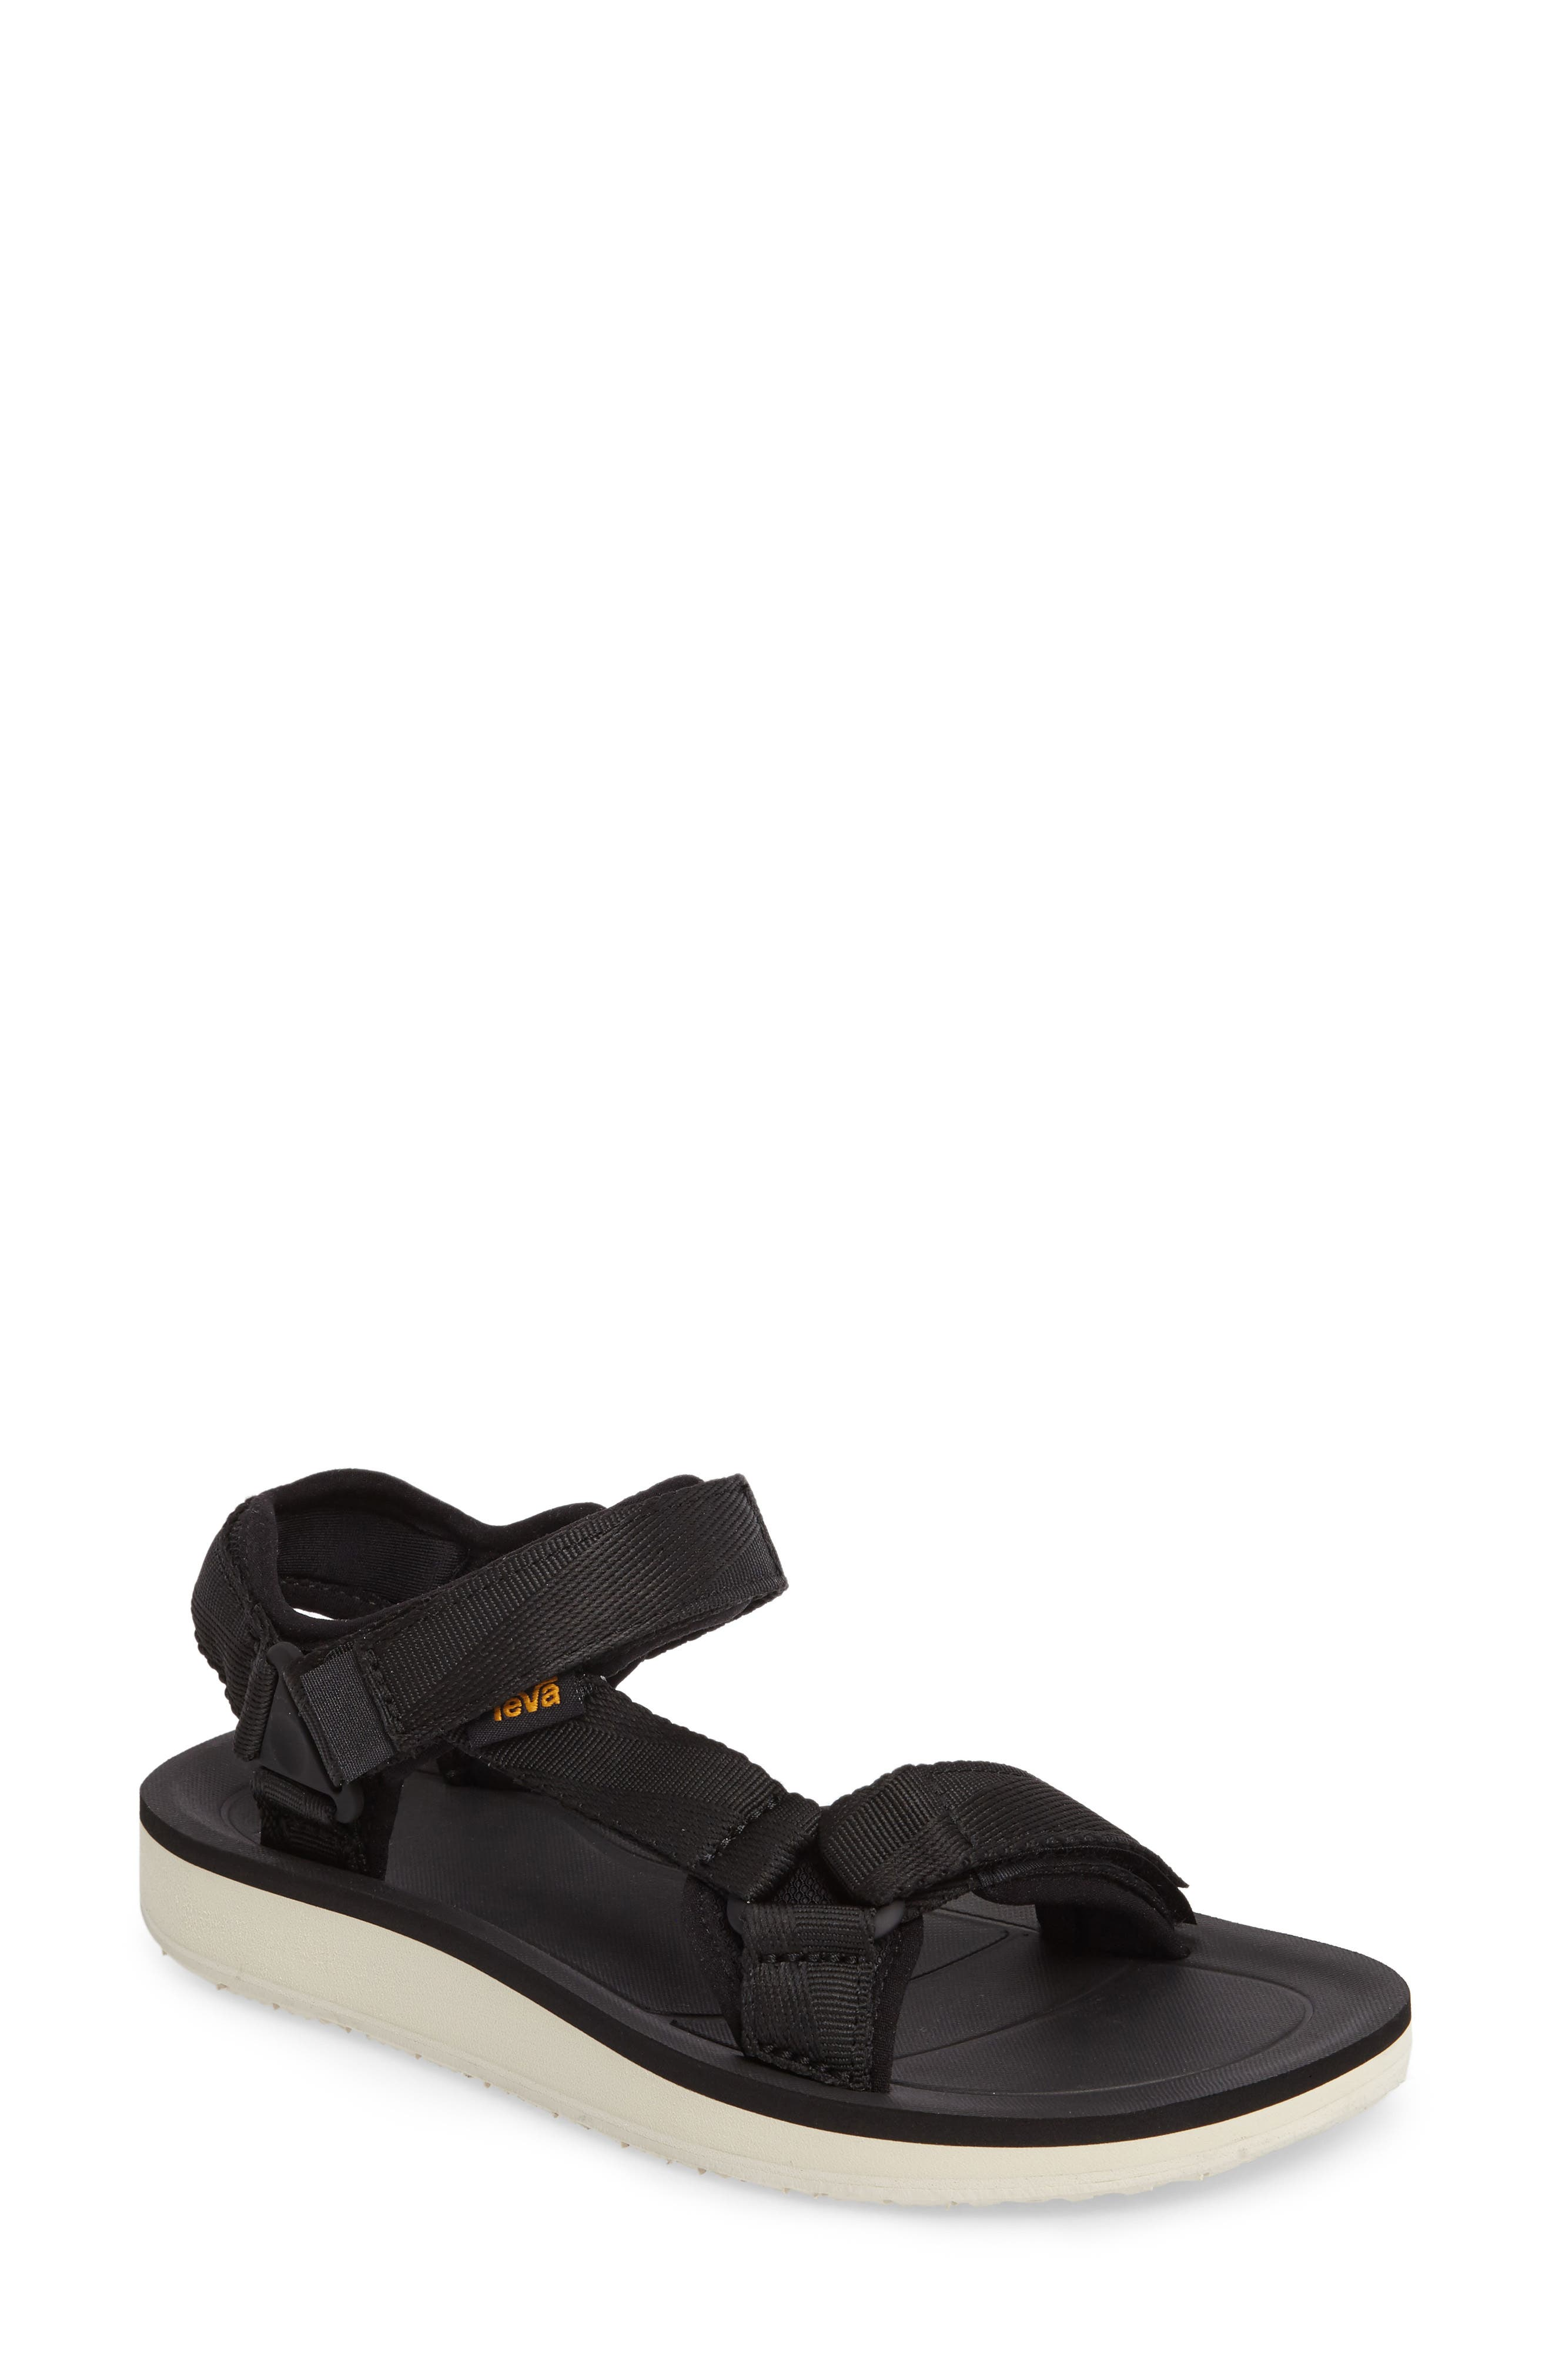 Original Universal Premier Sandal,                             Main thumbnail 1, color,                             Black Fabric